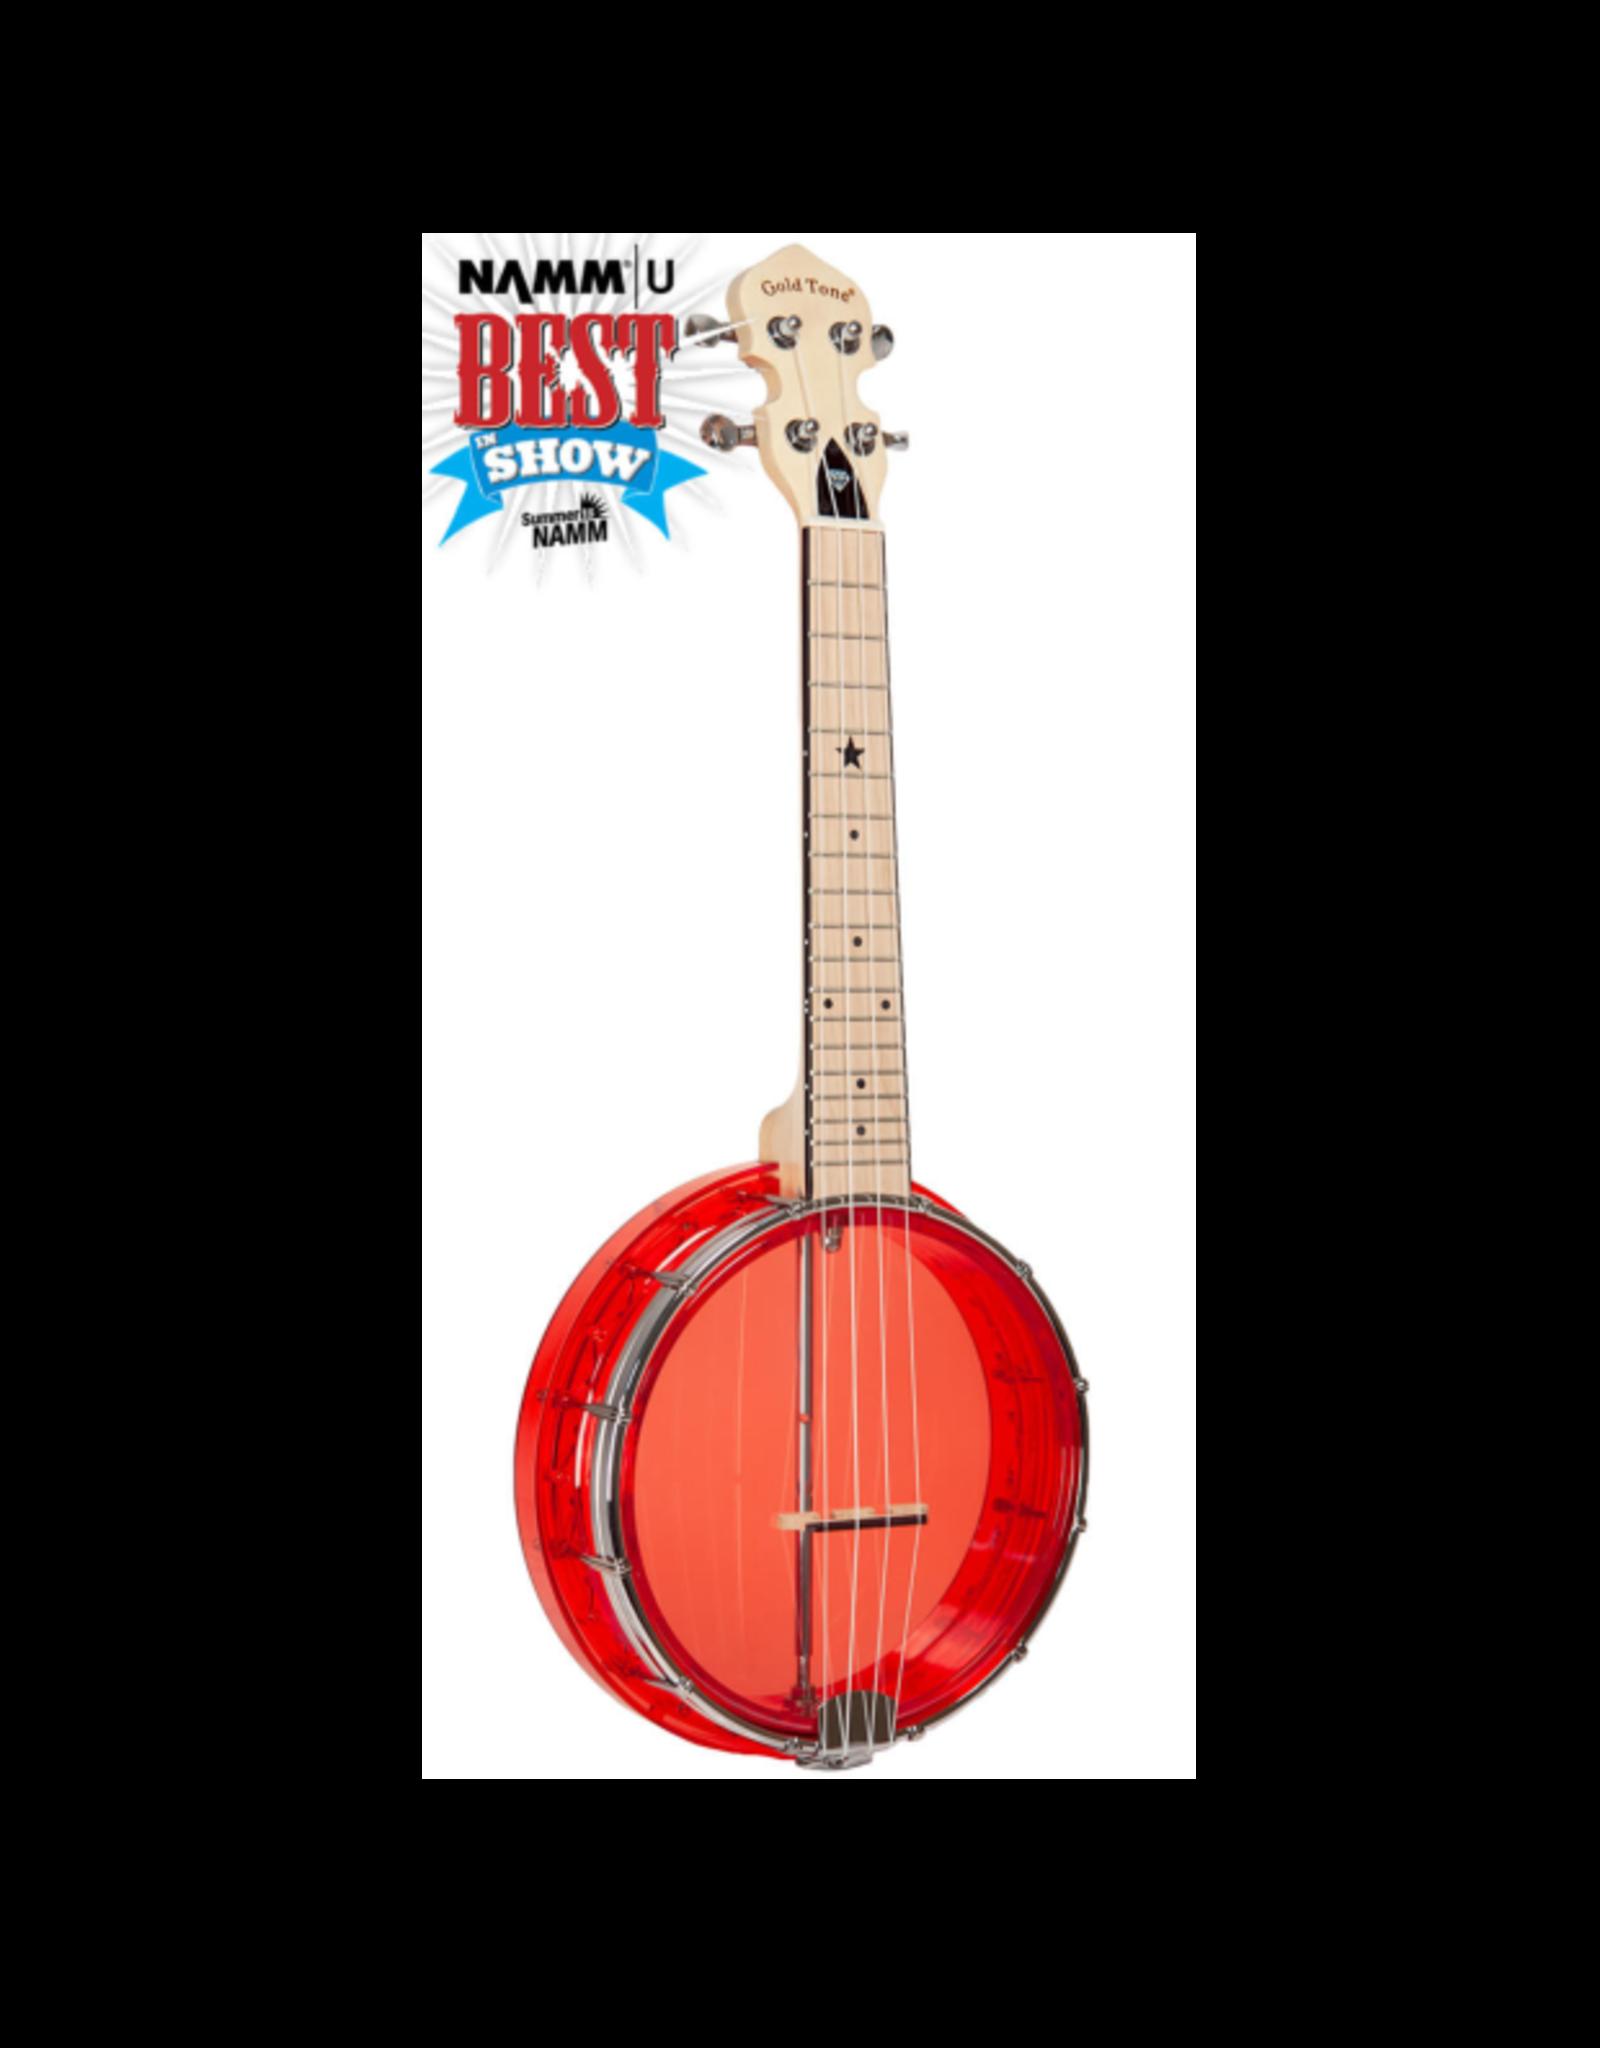 Gold Tone Little Gem Ruby (Red) See-Through Banjo Ukulele